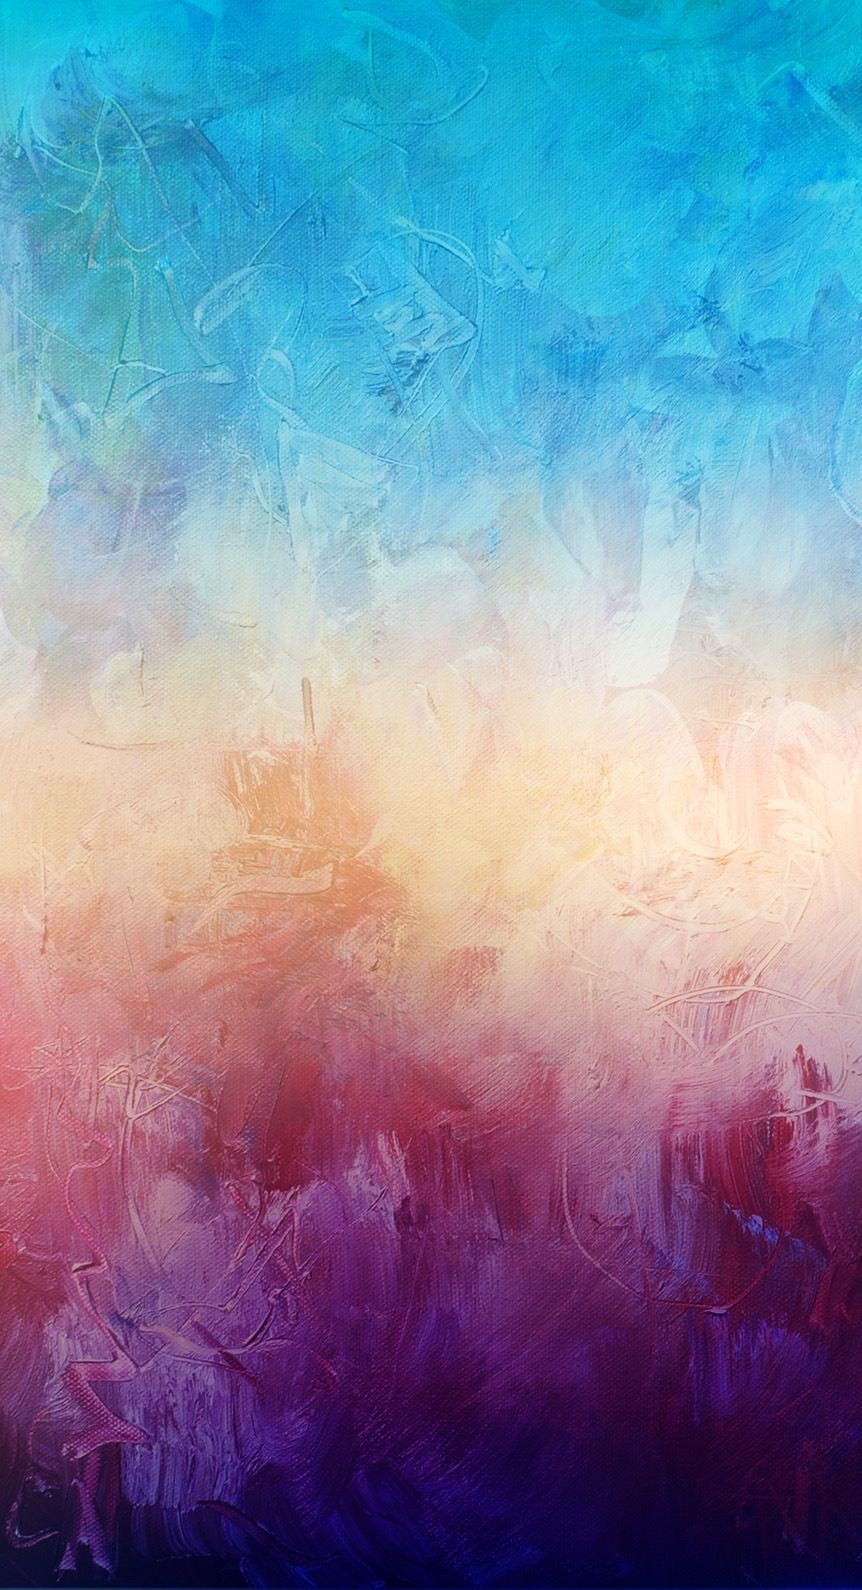 Colorful tumblr wallpaper iphone - 2016 Iphone Wallpaper Bing Images